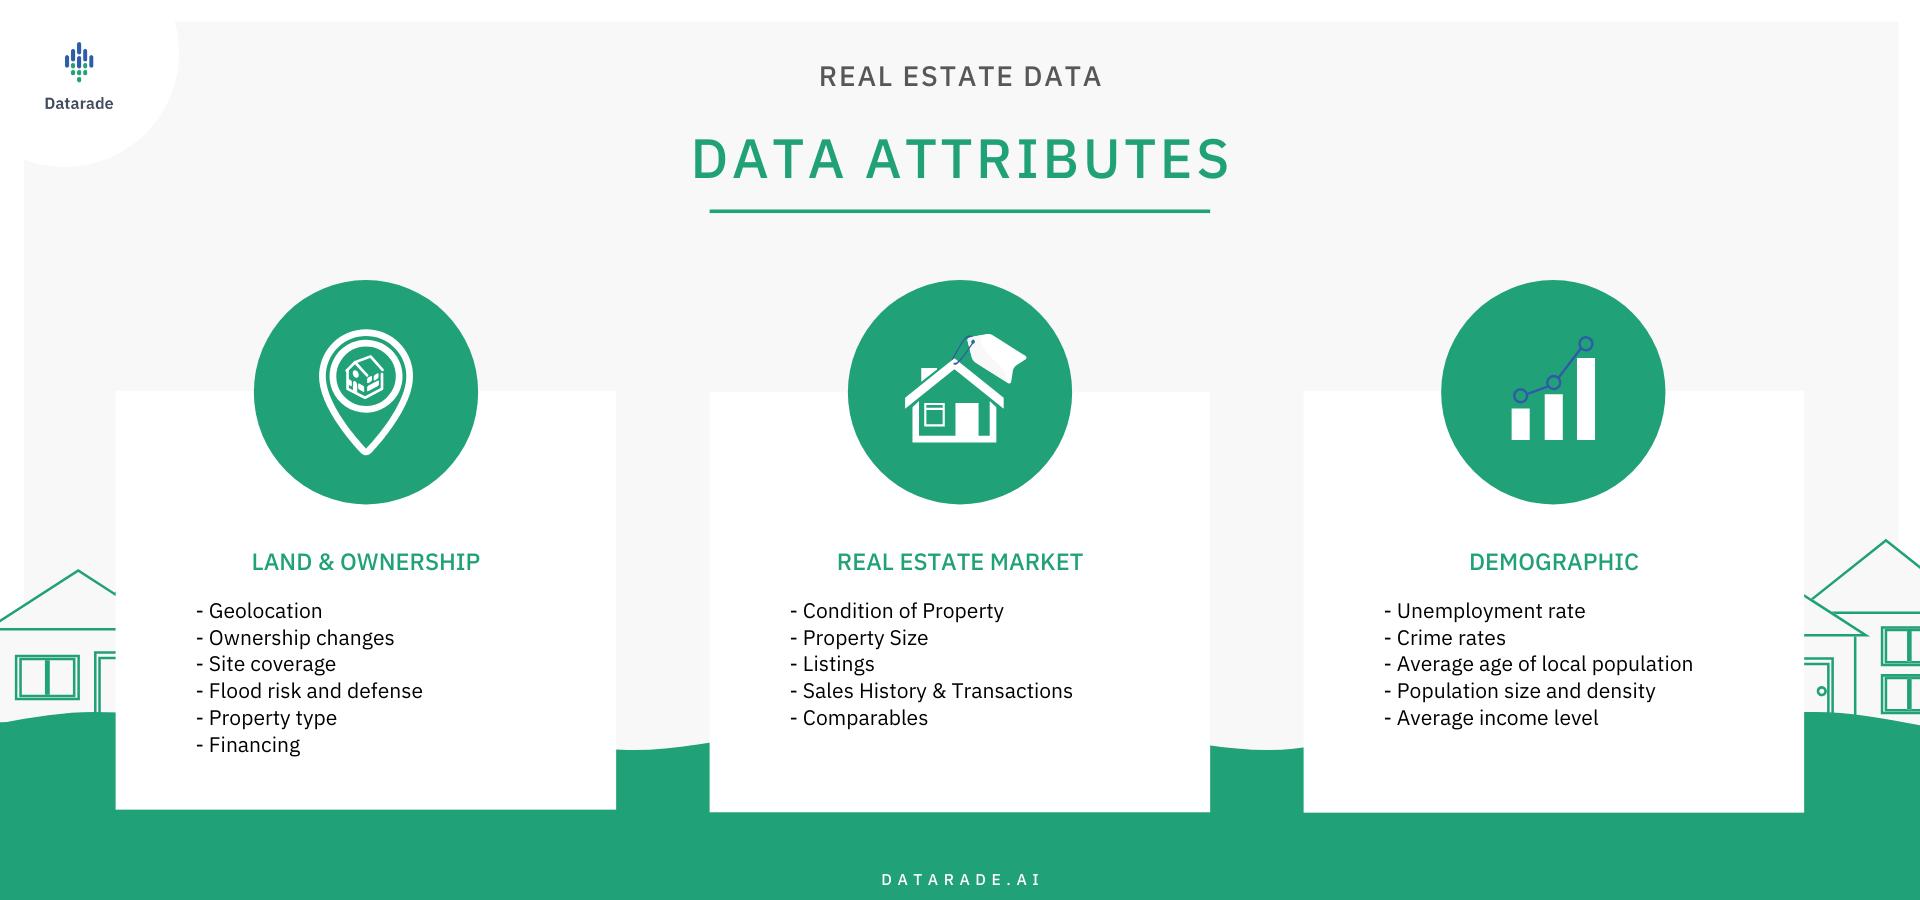 Real Estate Data Attributes